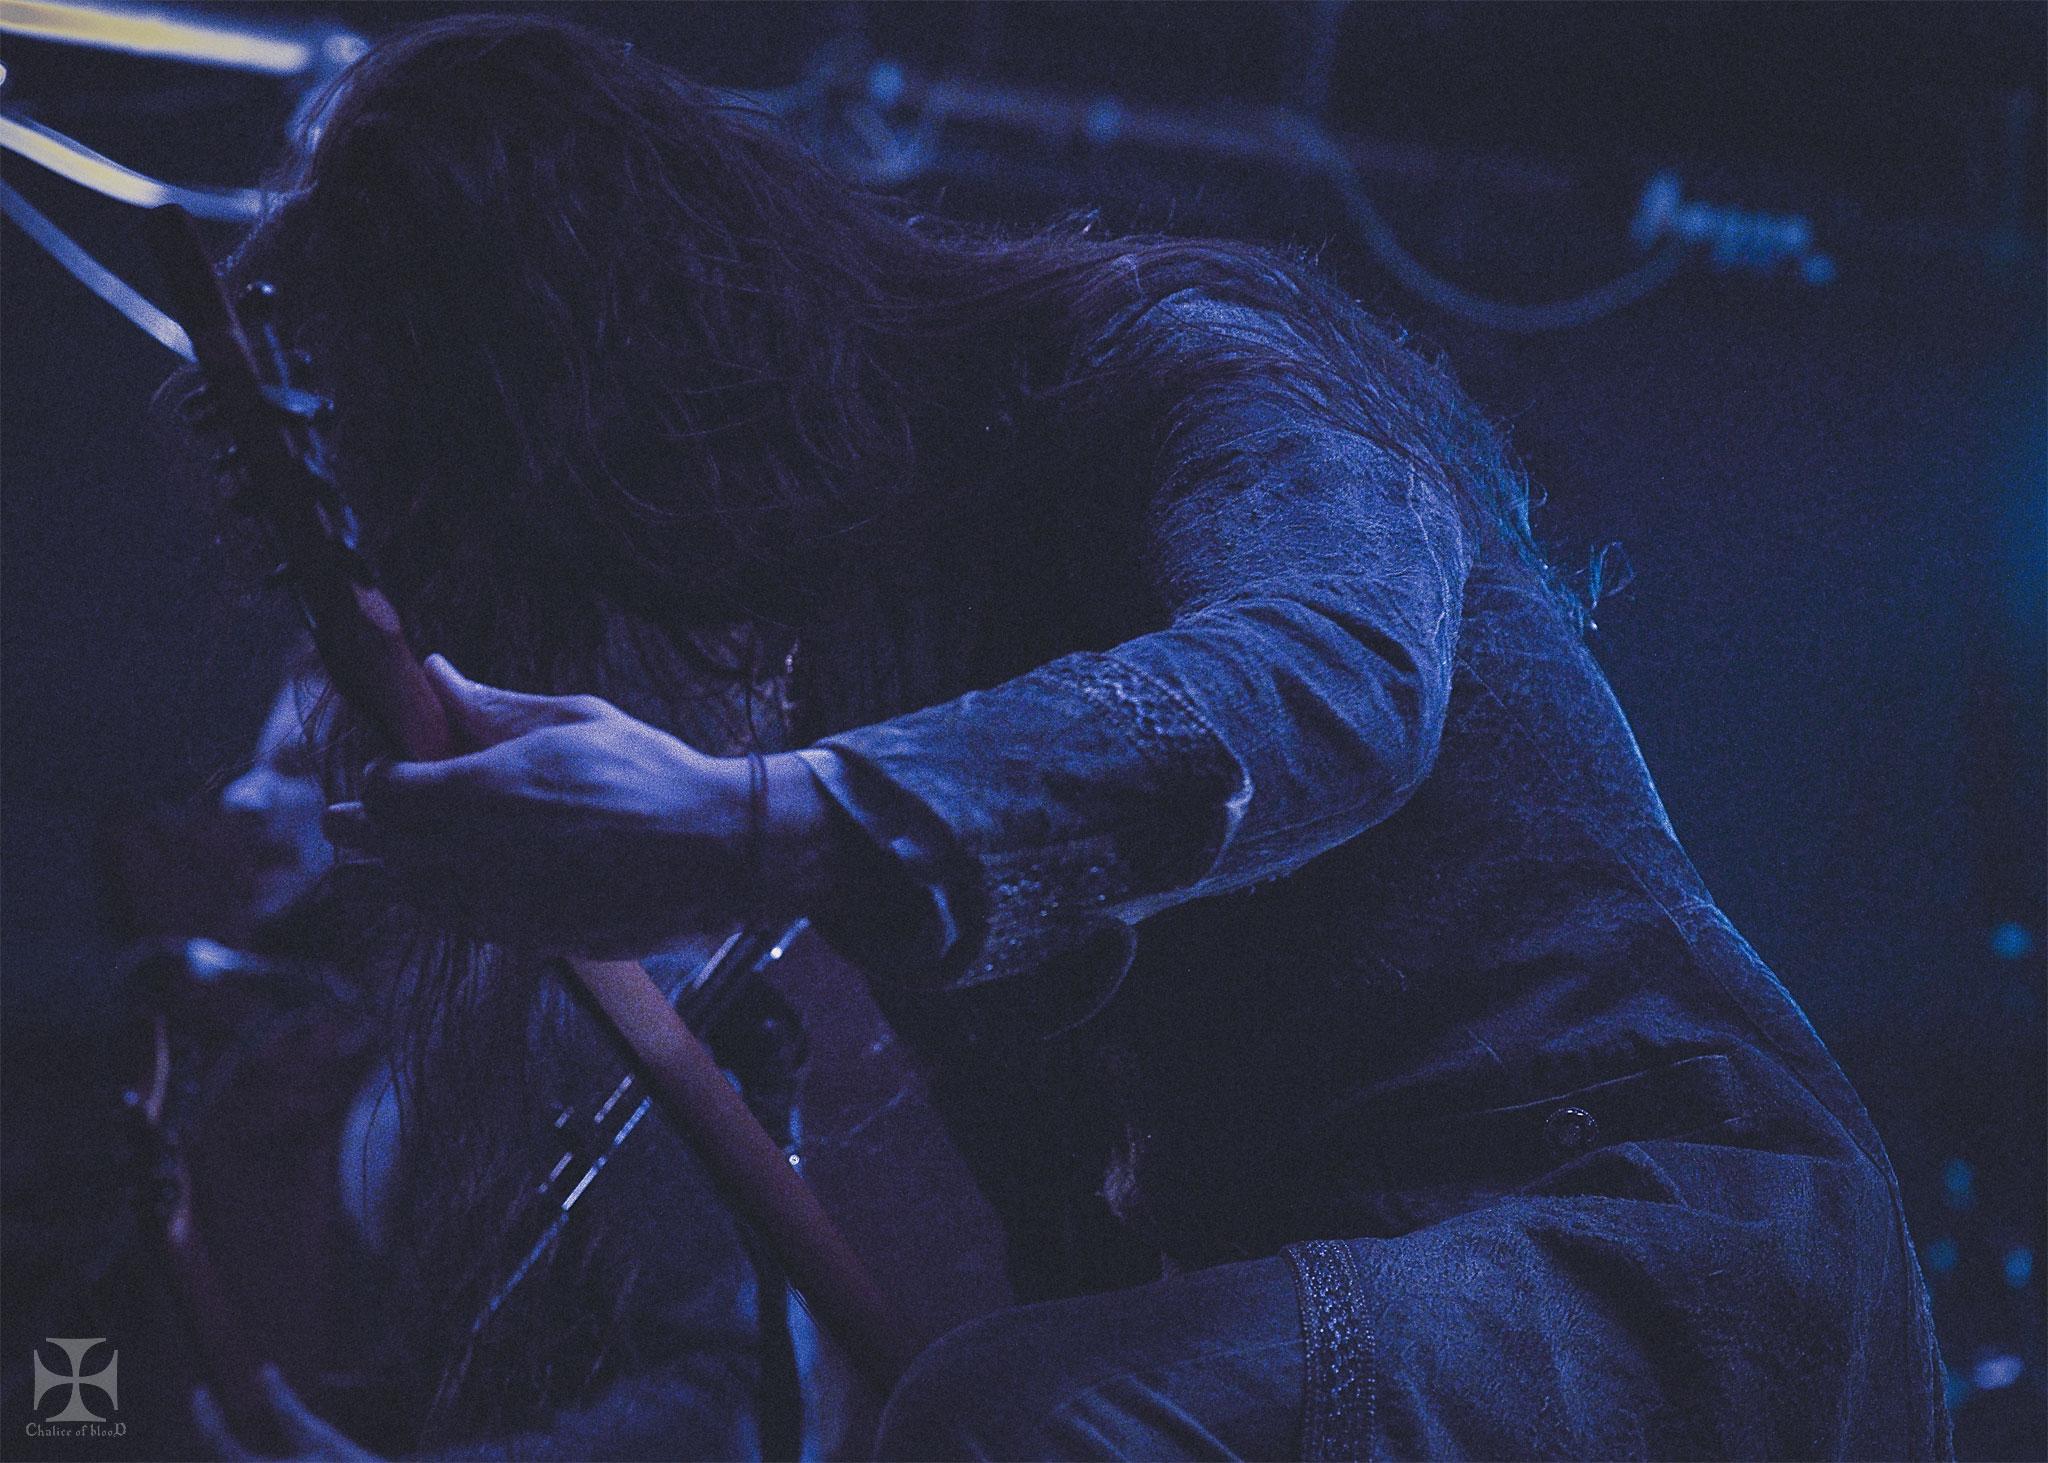 Fleshgod-Apocalypse-0120-Exposure-watermarked.jpg